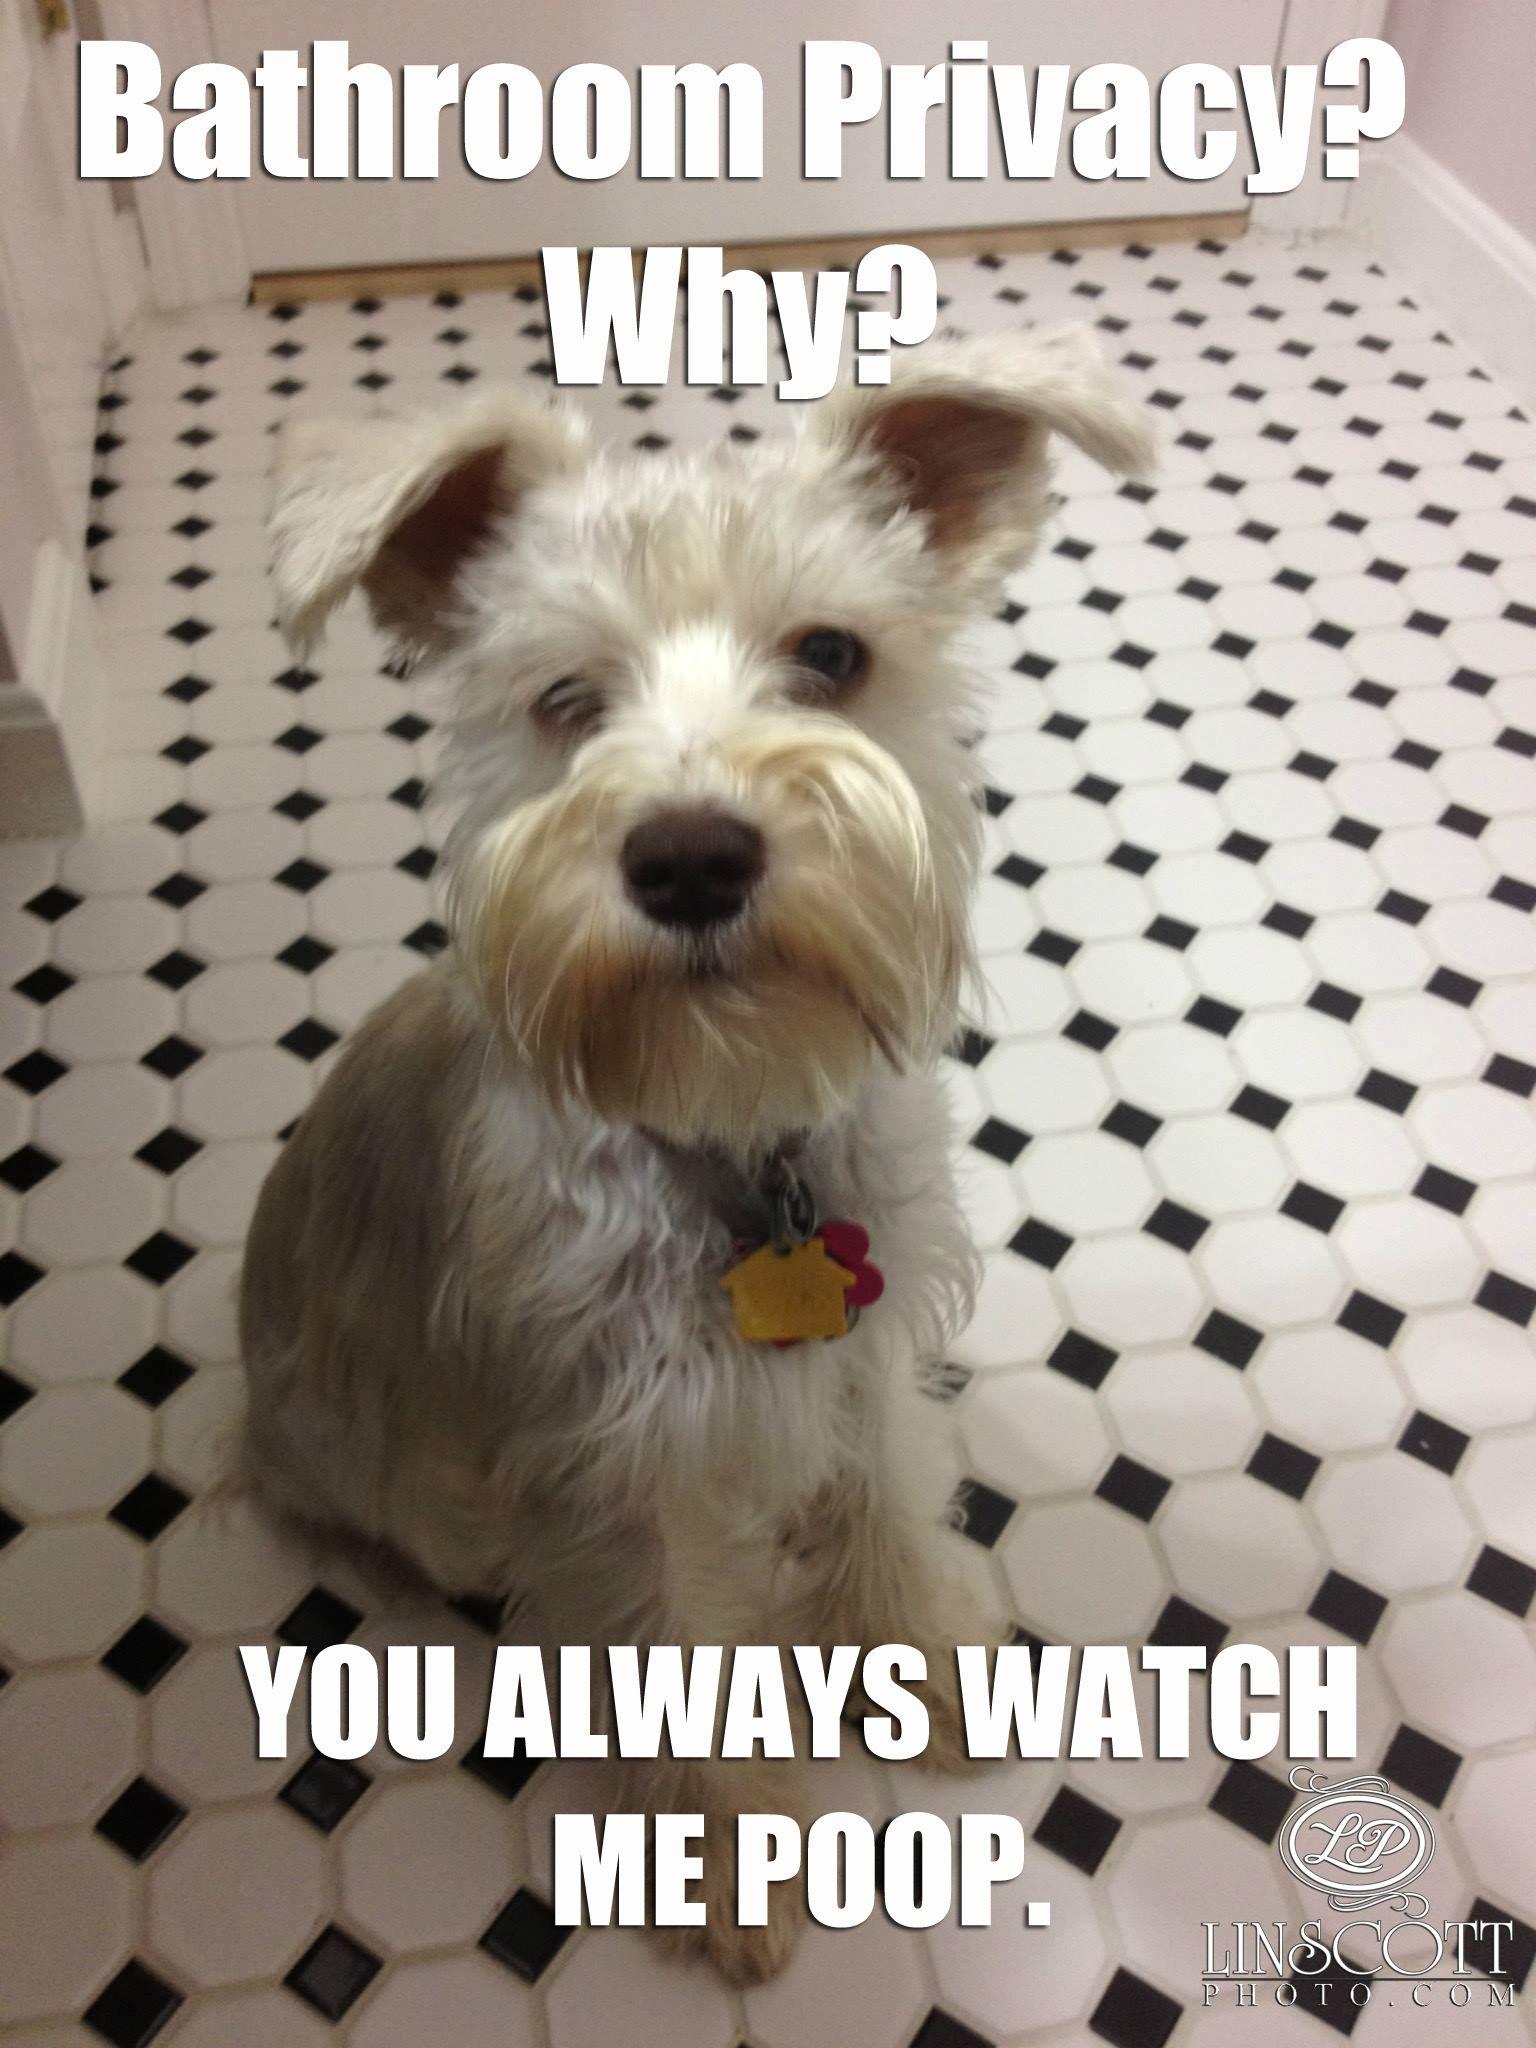 Miniature Schnauzer Memes Pompom Never Leaves My Side Www Linscottphoto Com Funny Animals Funny Animal Pictures Funny Dog Pictures